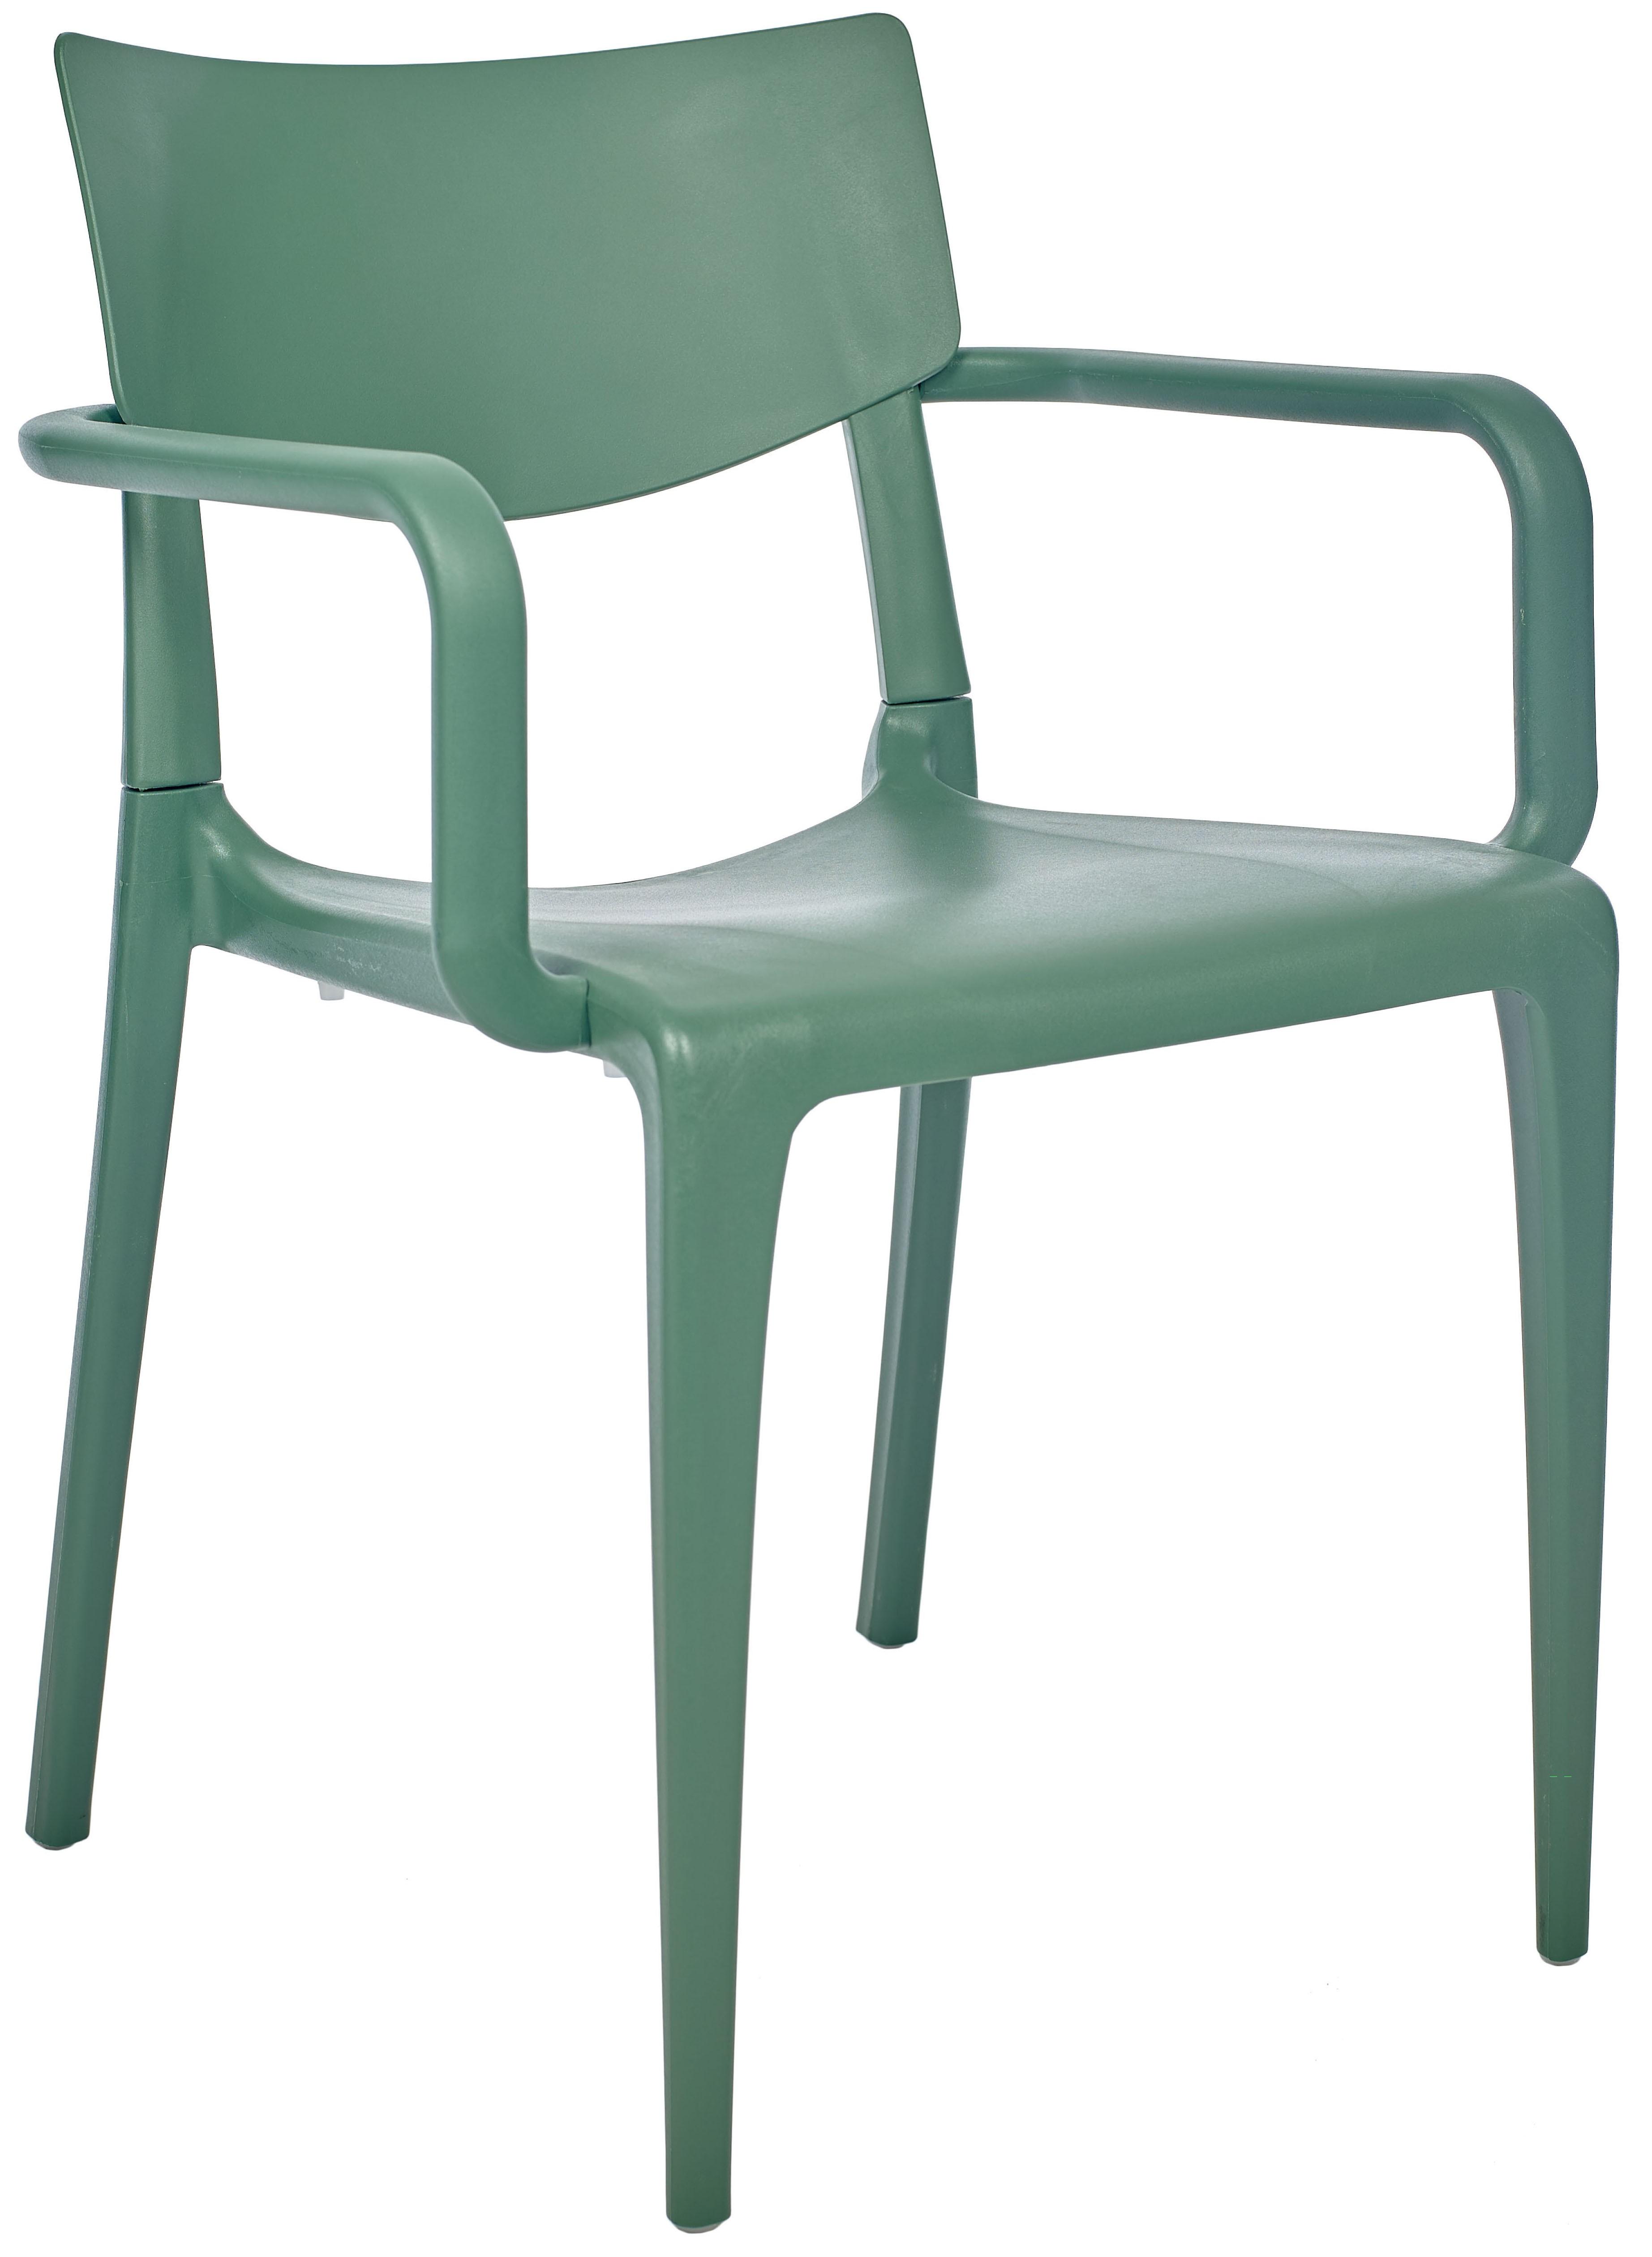 Silla Ezpeleta Con brazos Polipropileno  green